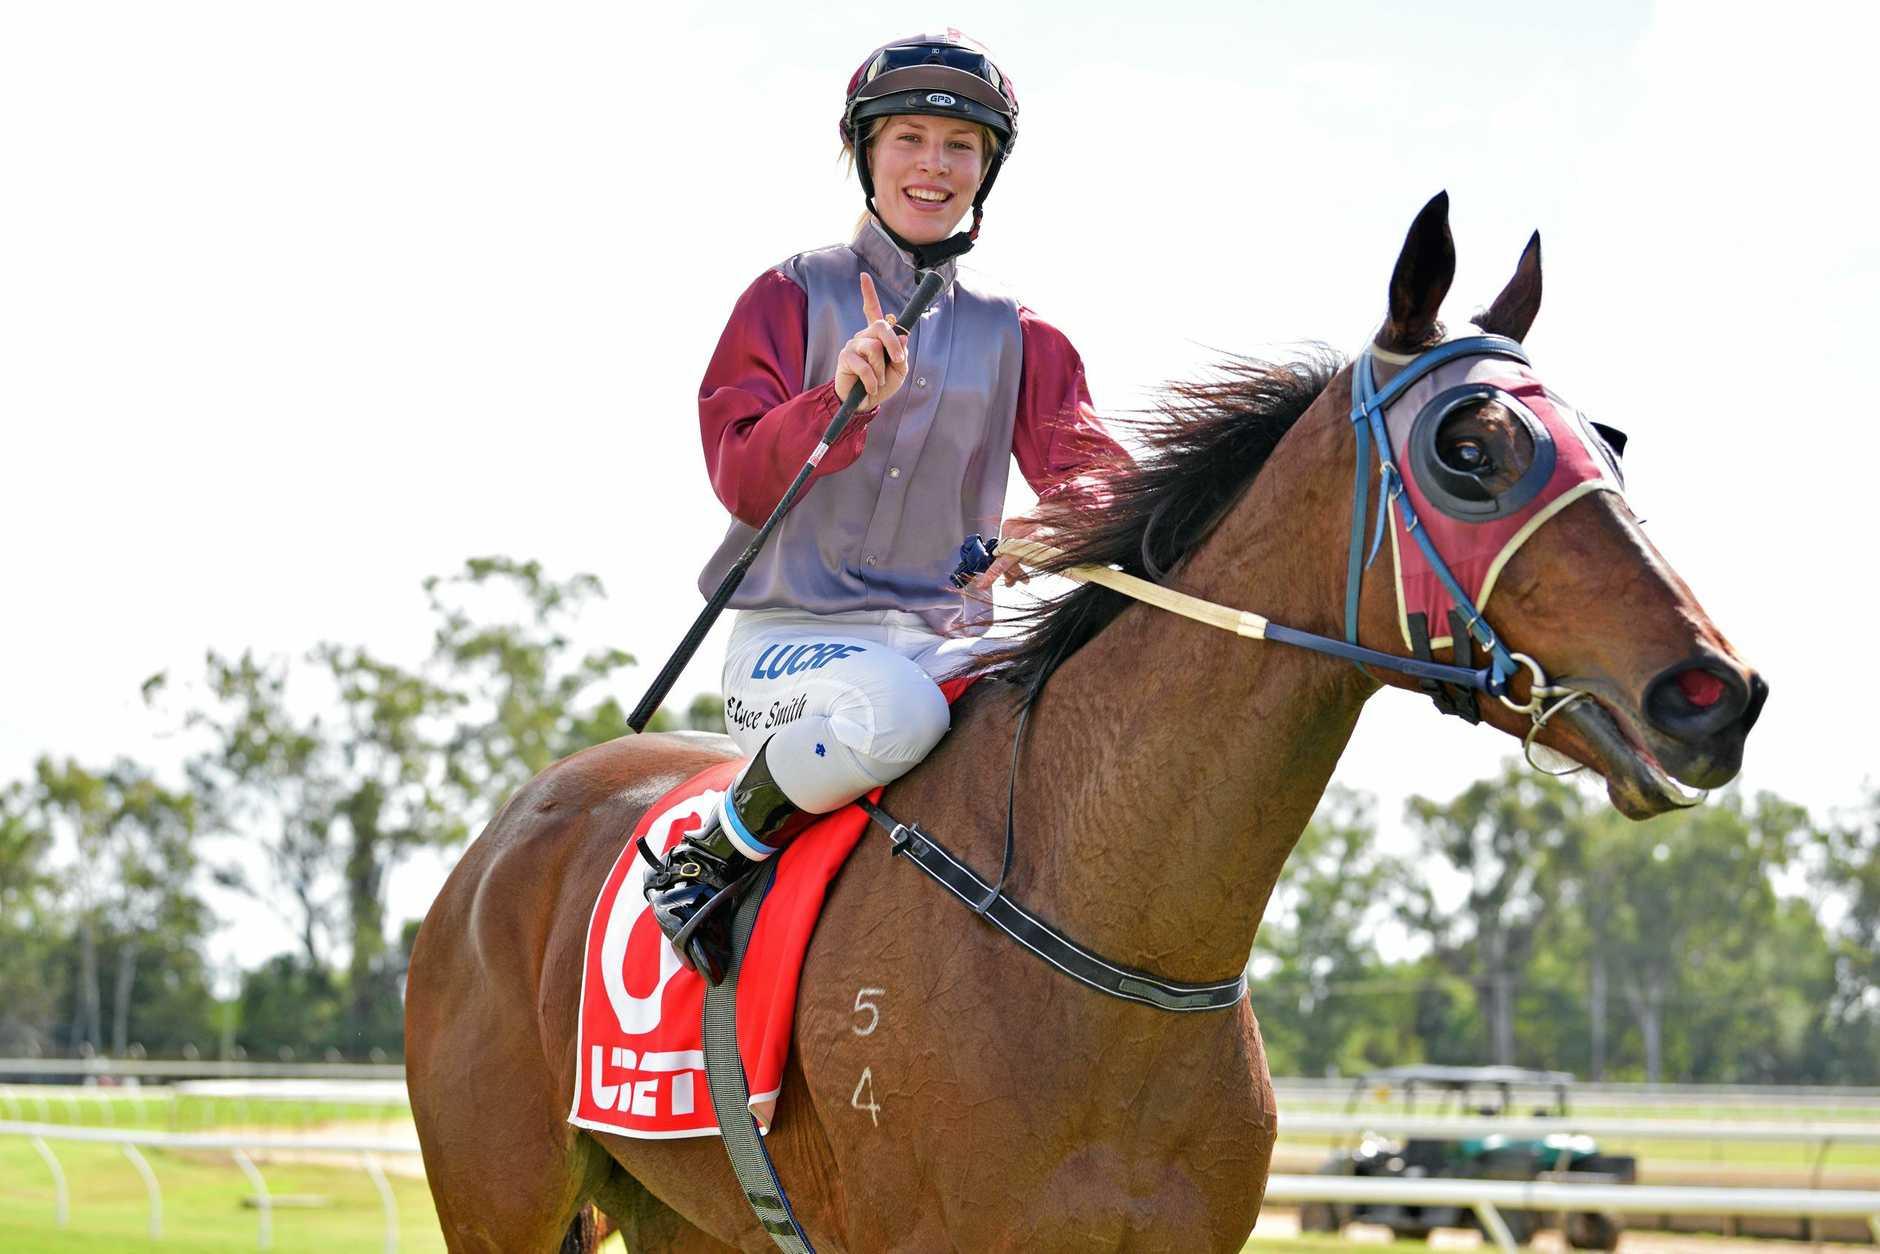 Elyce Smith won the Rockhampton Jockey Club's apprentice jockey premiership in her first season riding the provincial circuit.